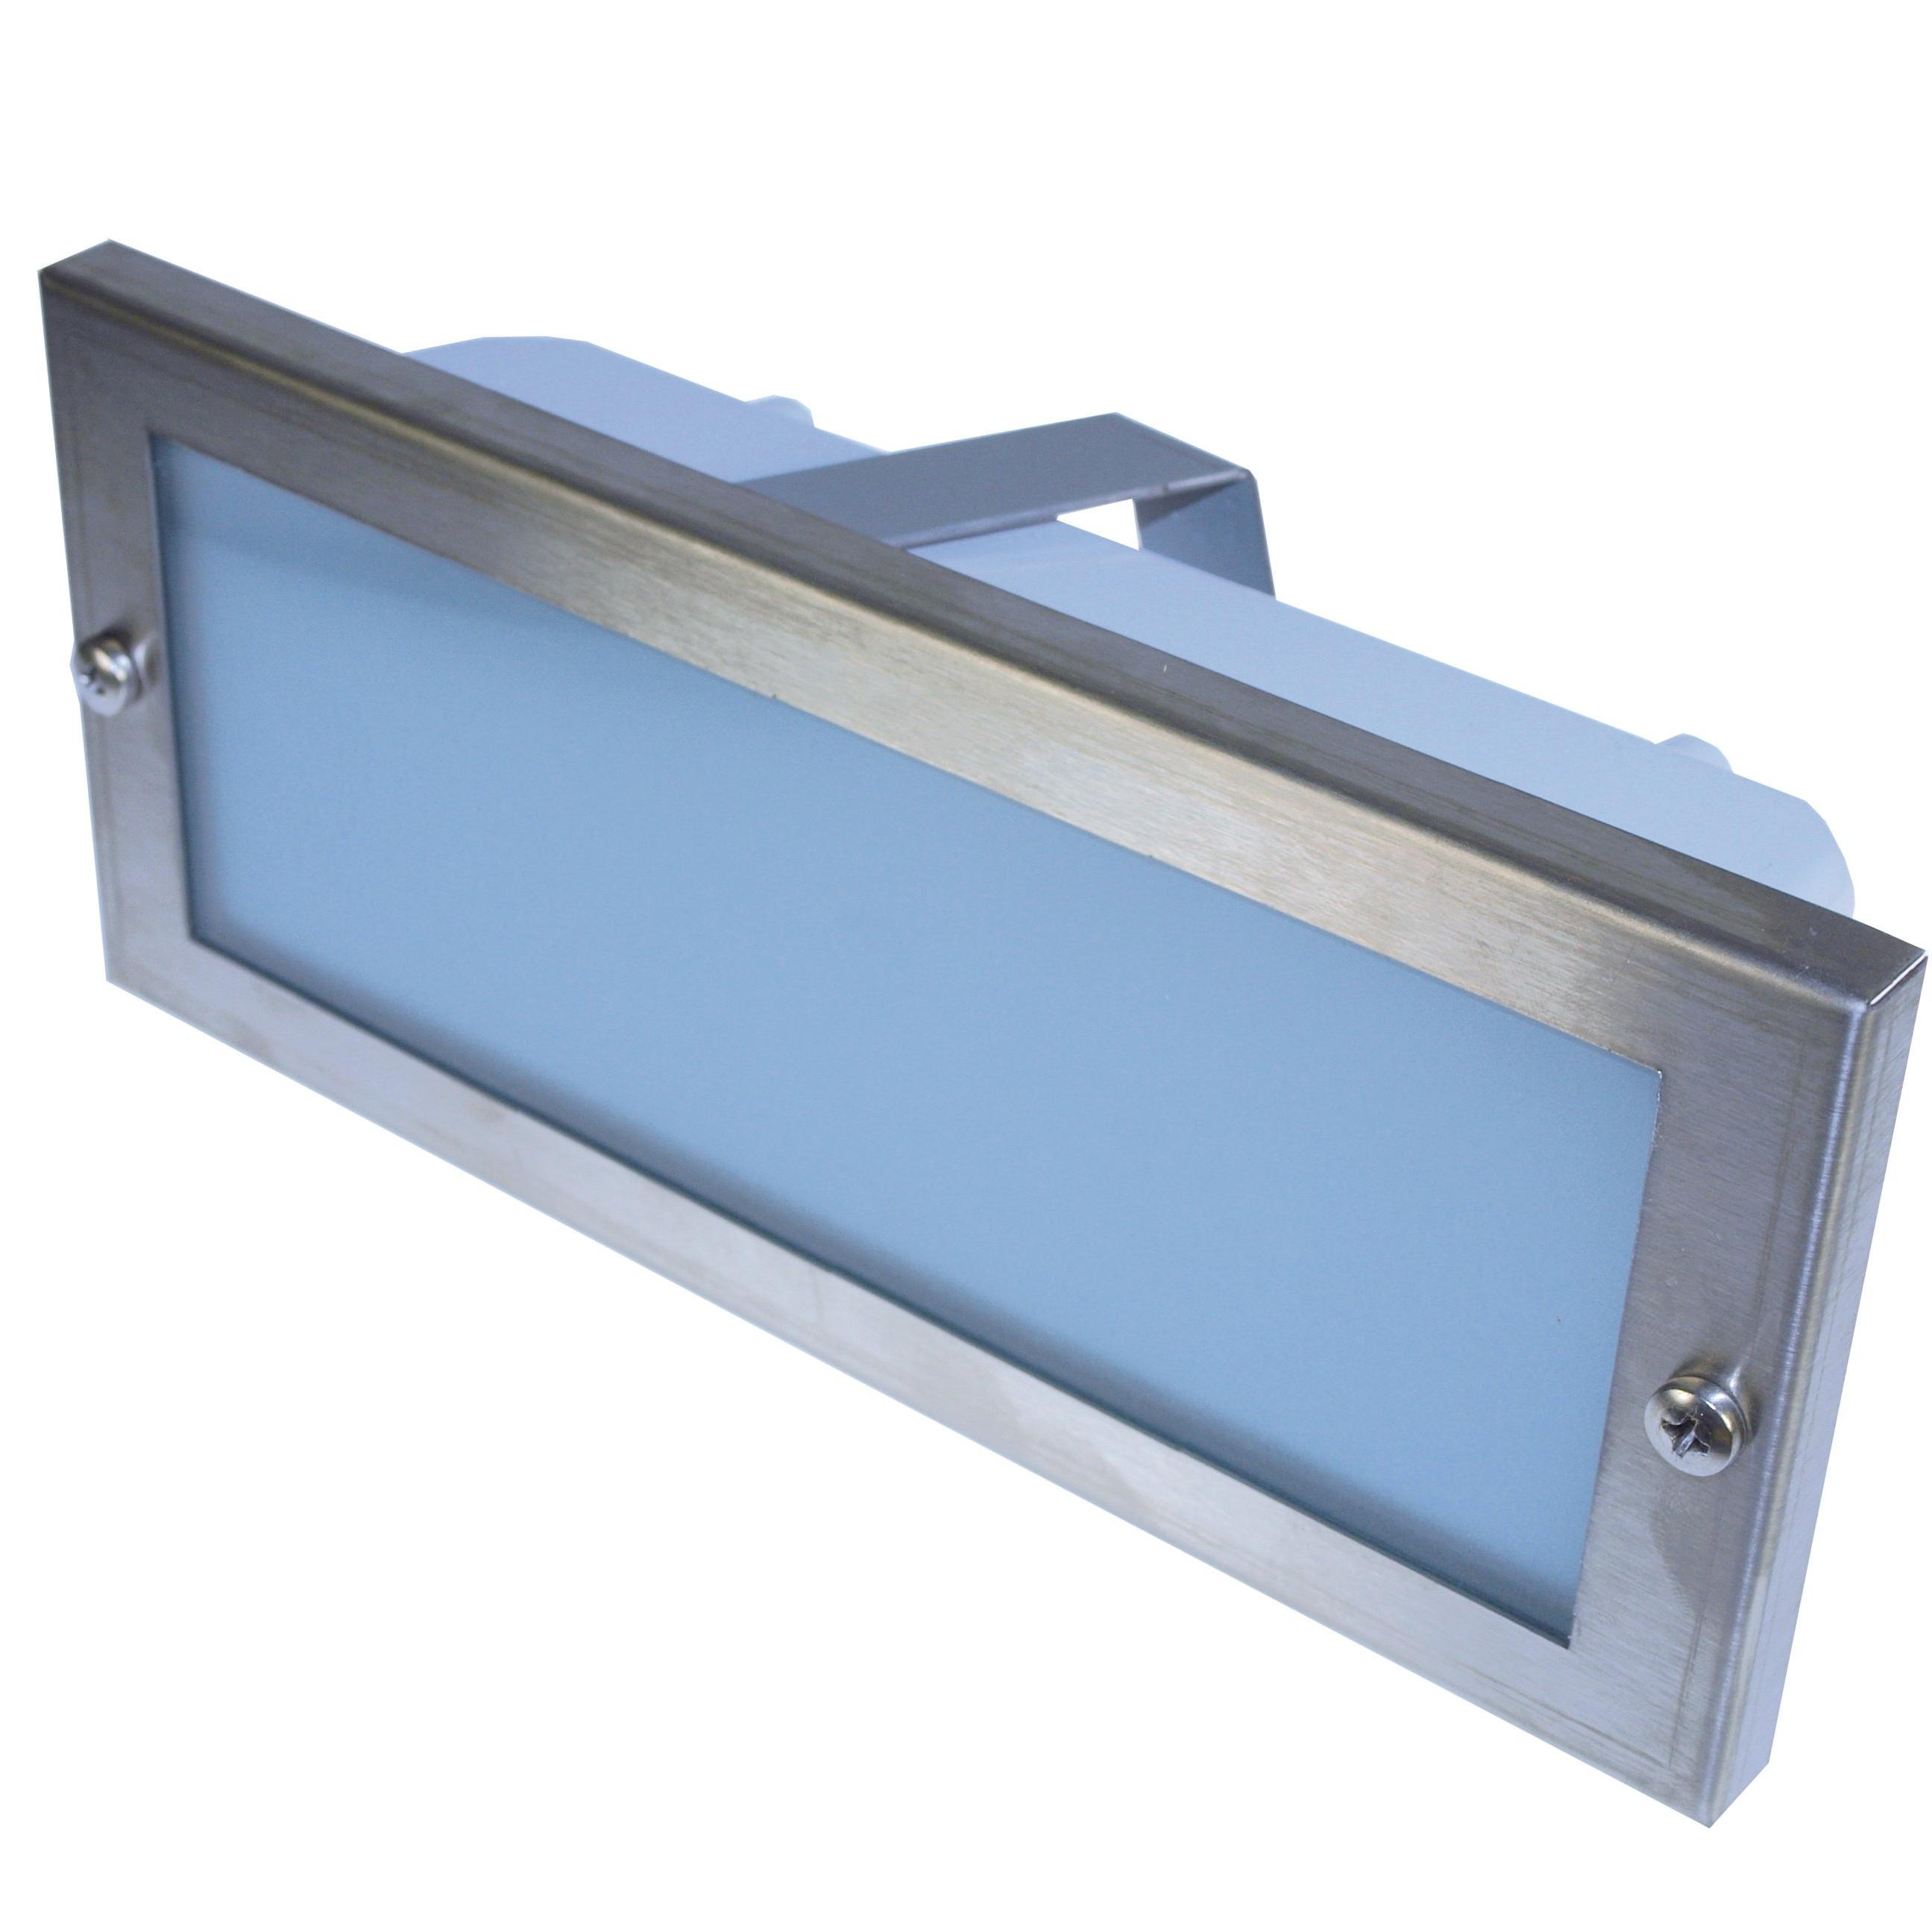 Notleuchte EP Autotest LED 3h 230VAC Einbaumontage